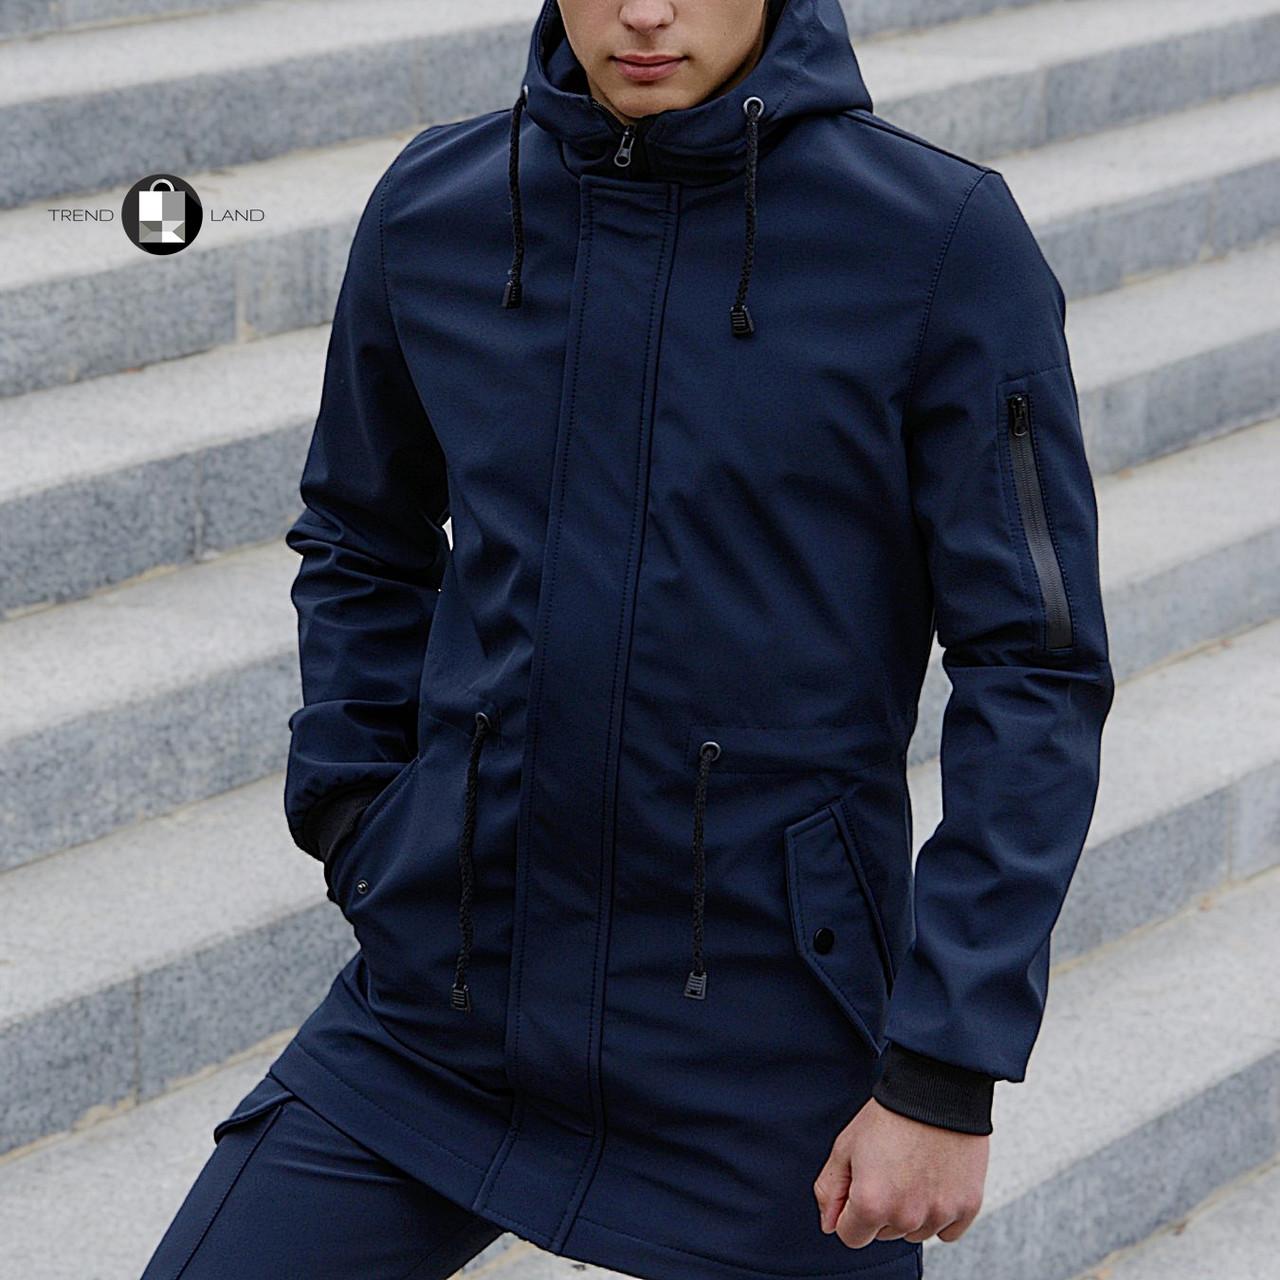 Размеры S-2XL | Мужская куртка Intruder Softshell V2.0 Dark Blue Темно-синяя